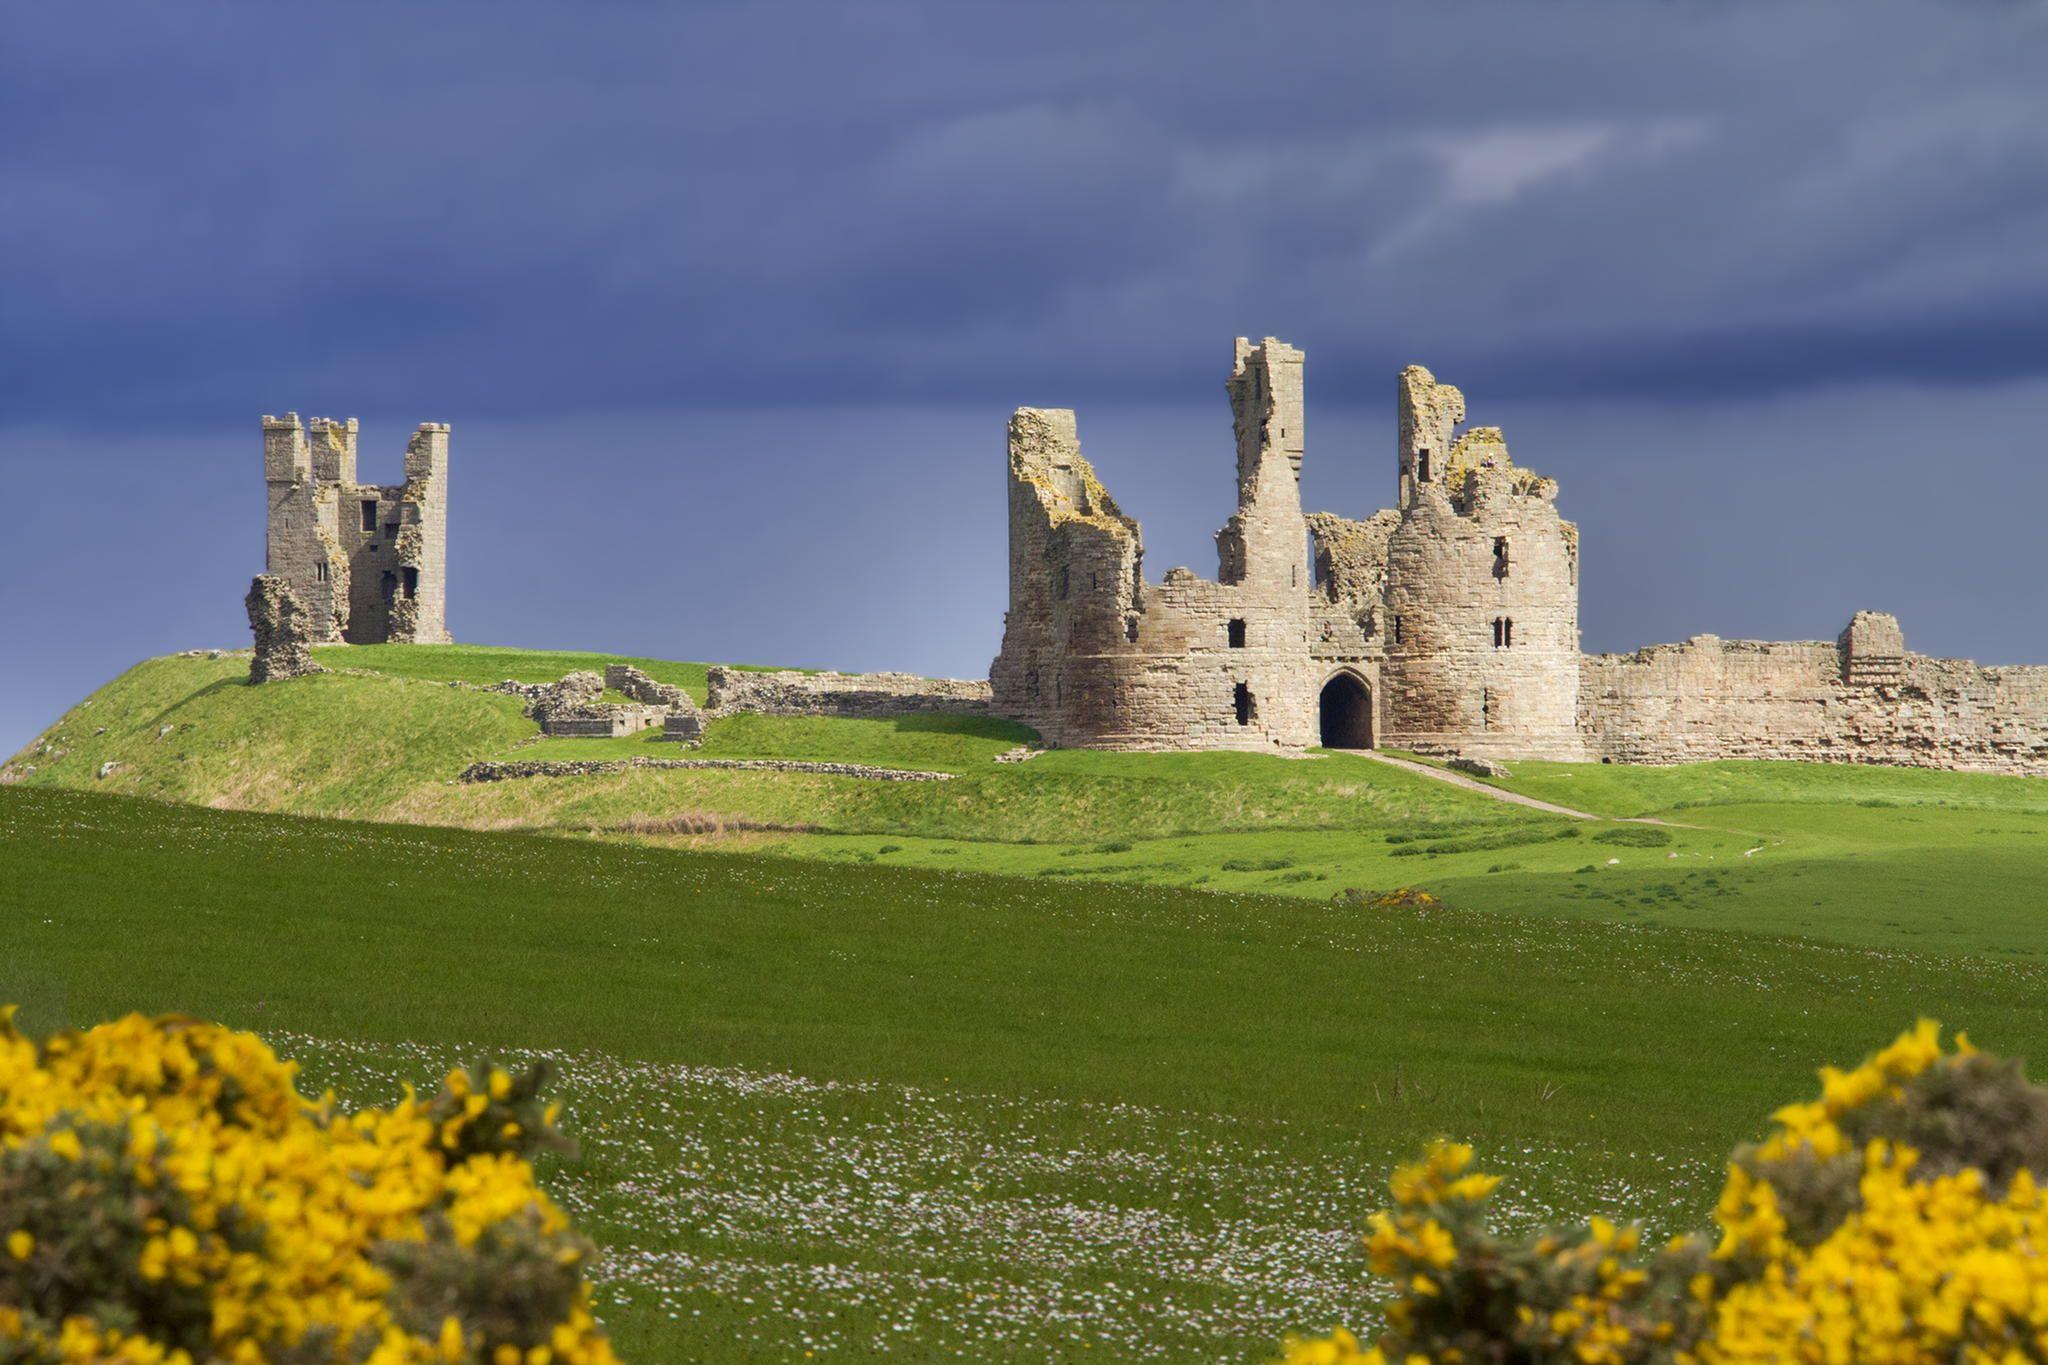 Dunstanburgh Castle - Dunstanburgh Castle, Northumberland, England